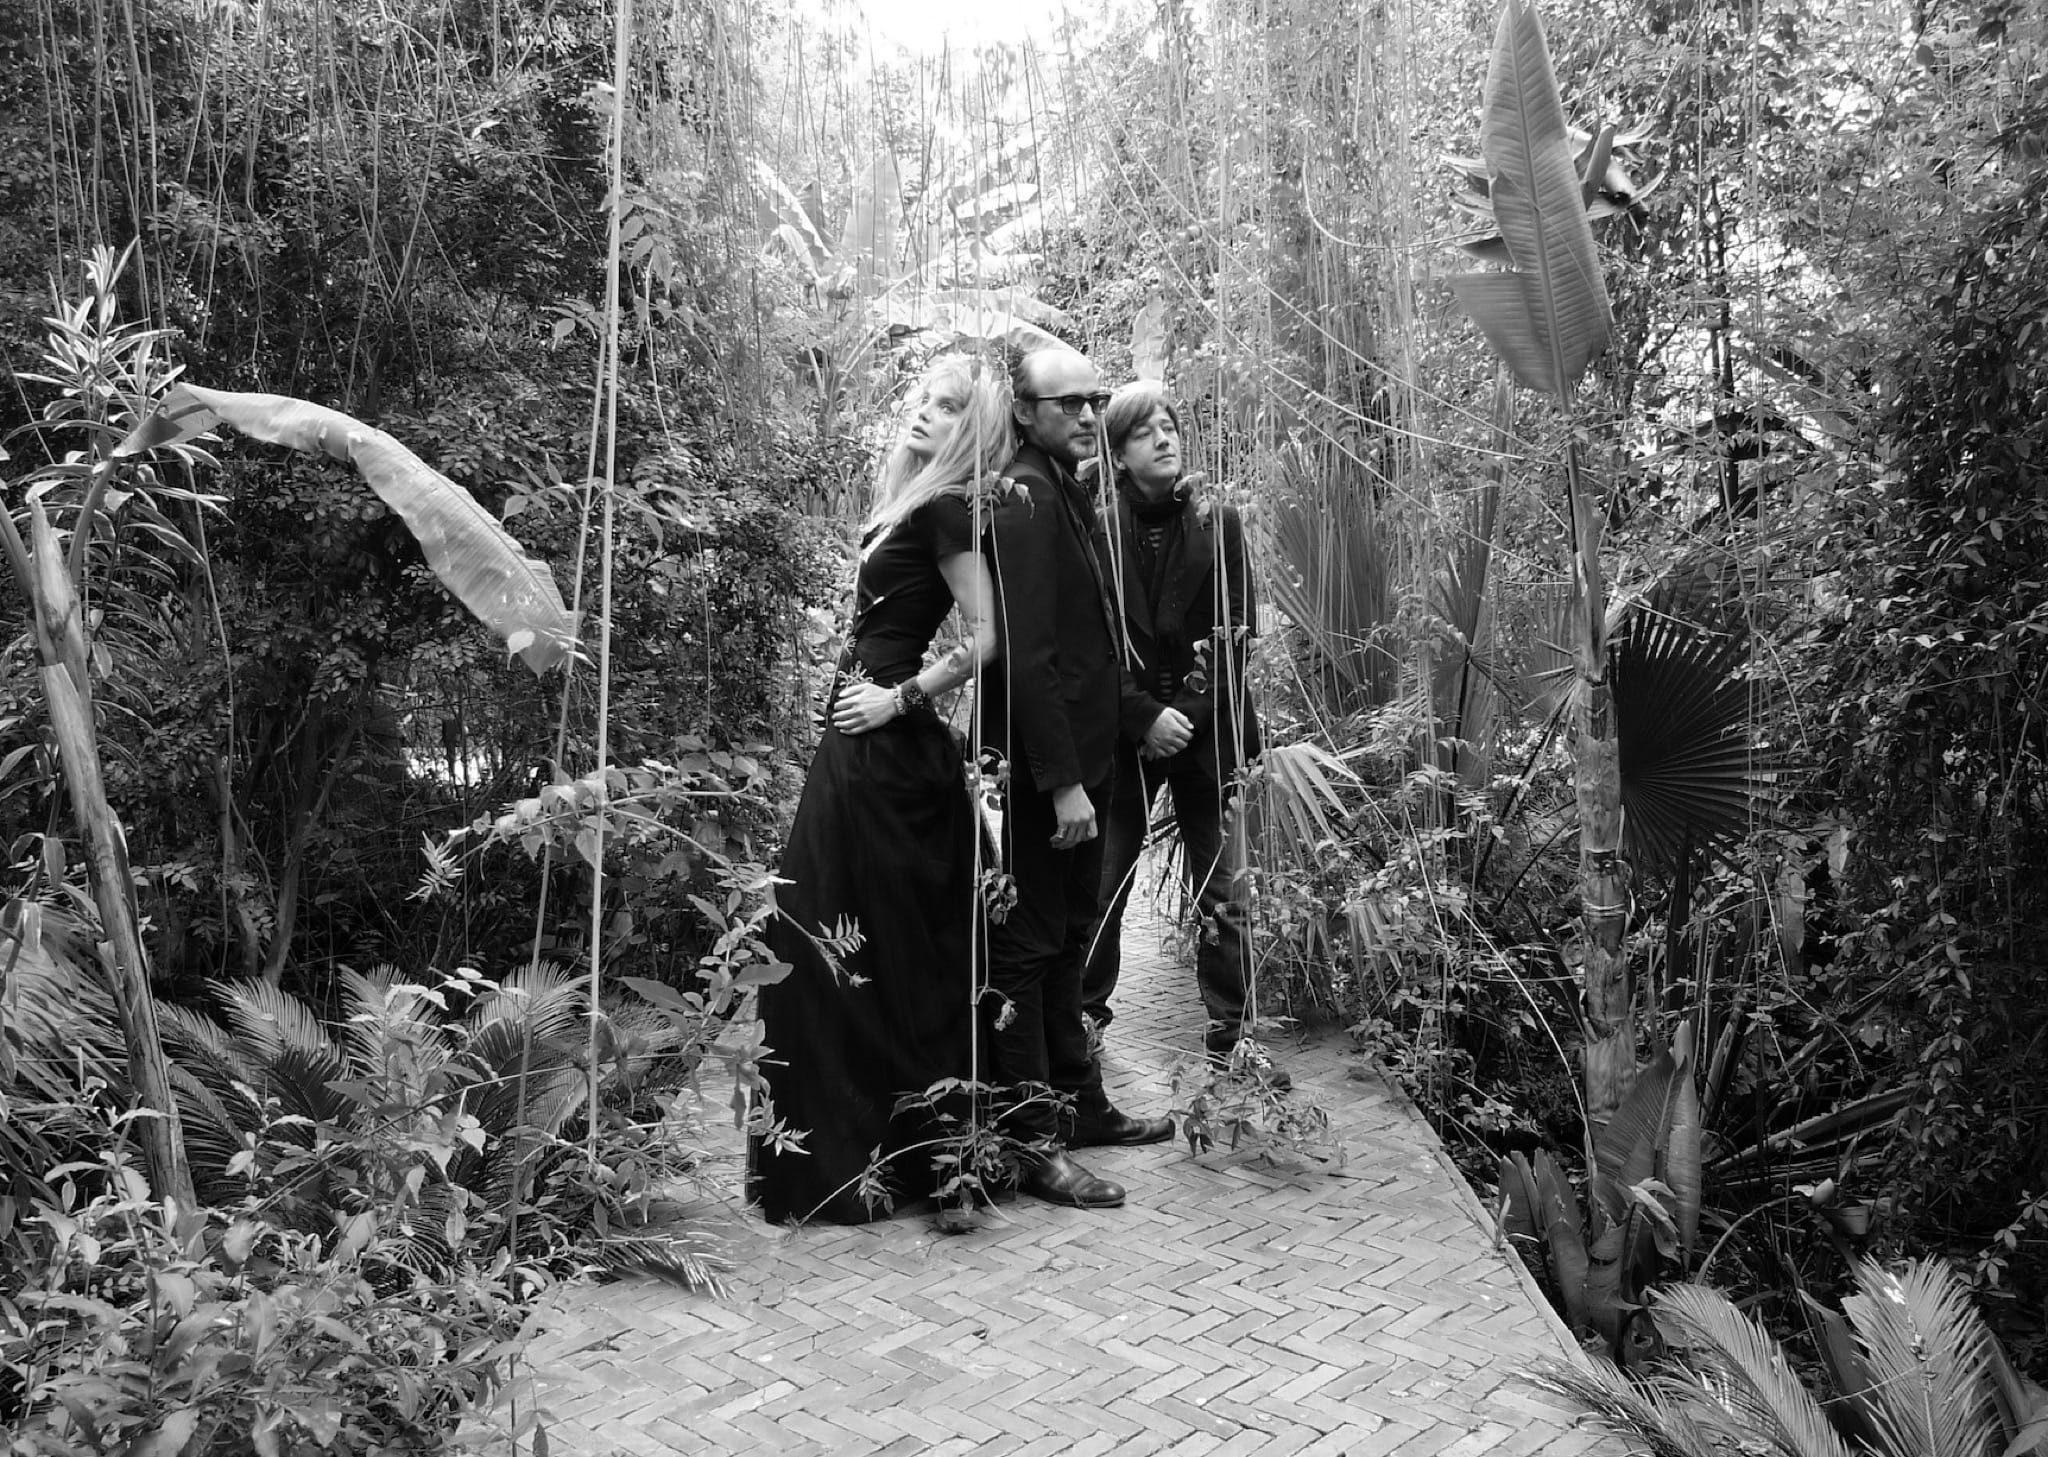 arielle-dombasle-nicolas-ker-album-la-riviere-atlantique-image-1